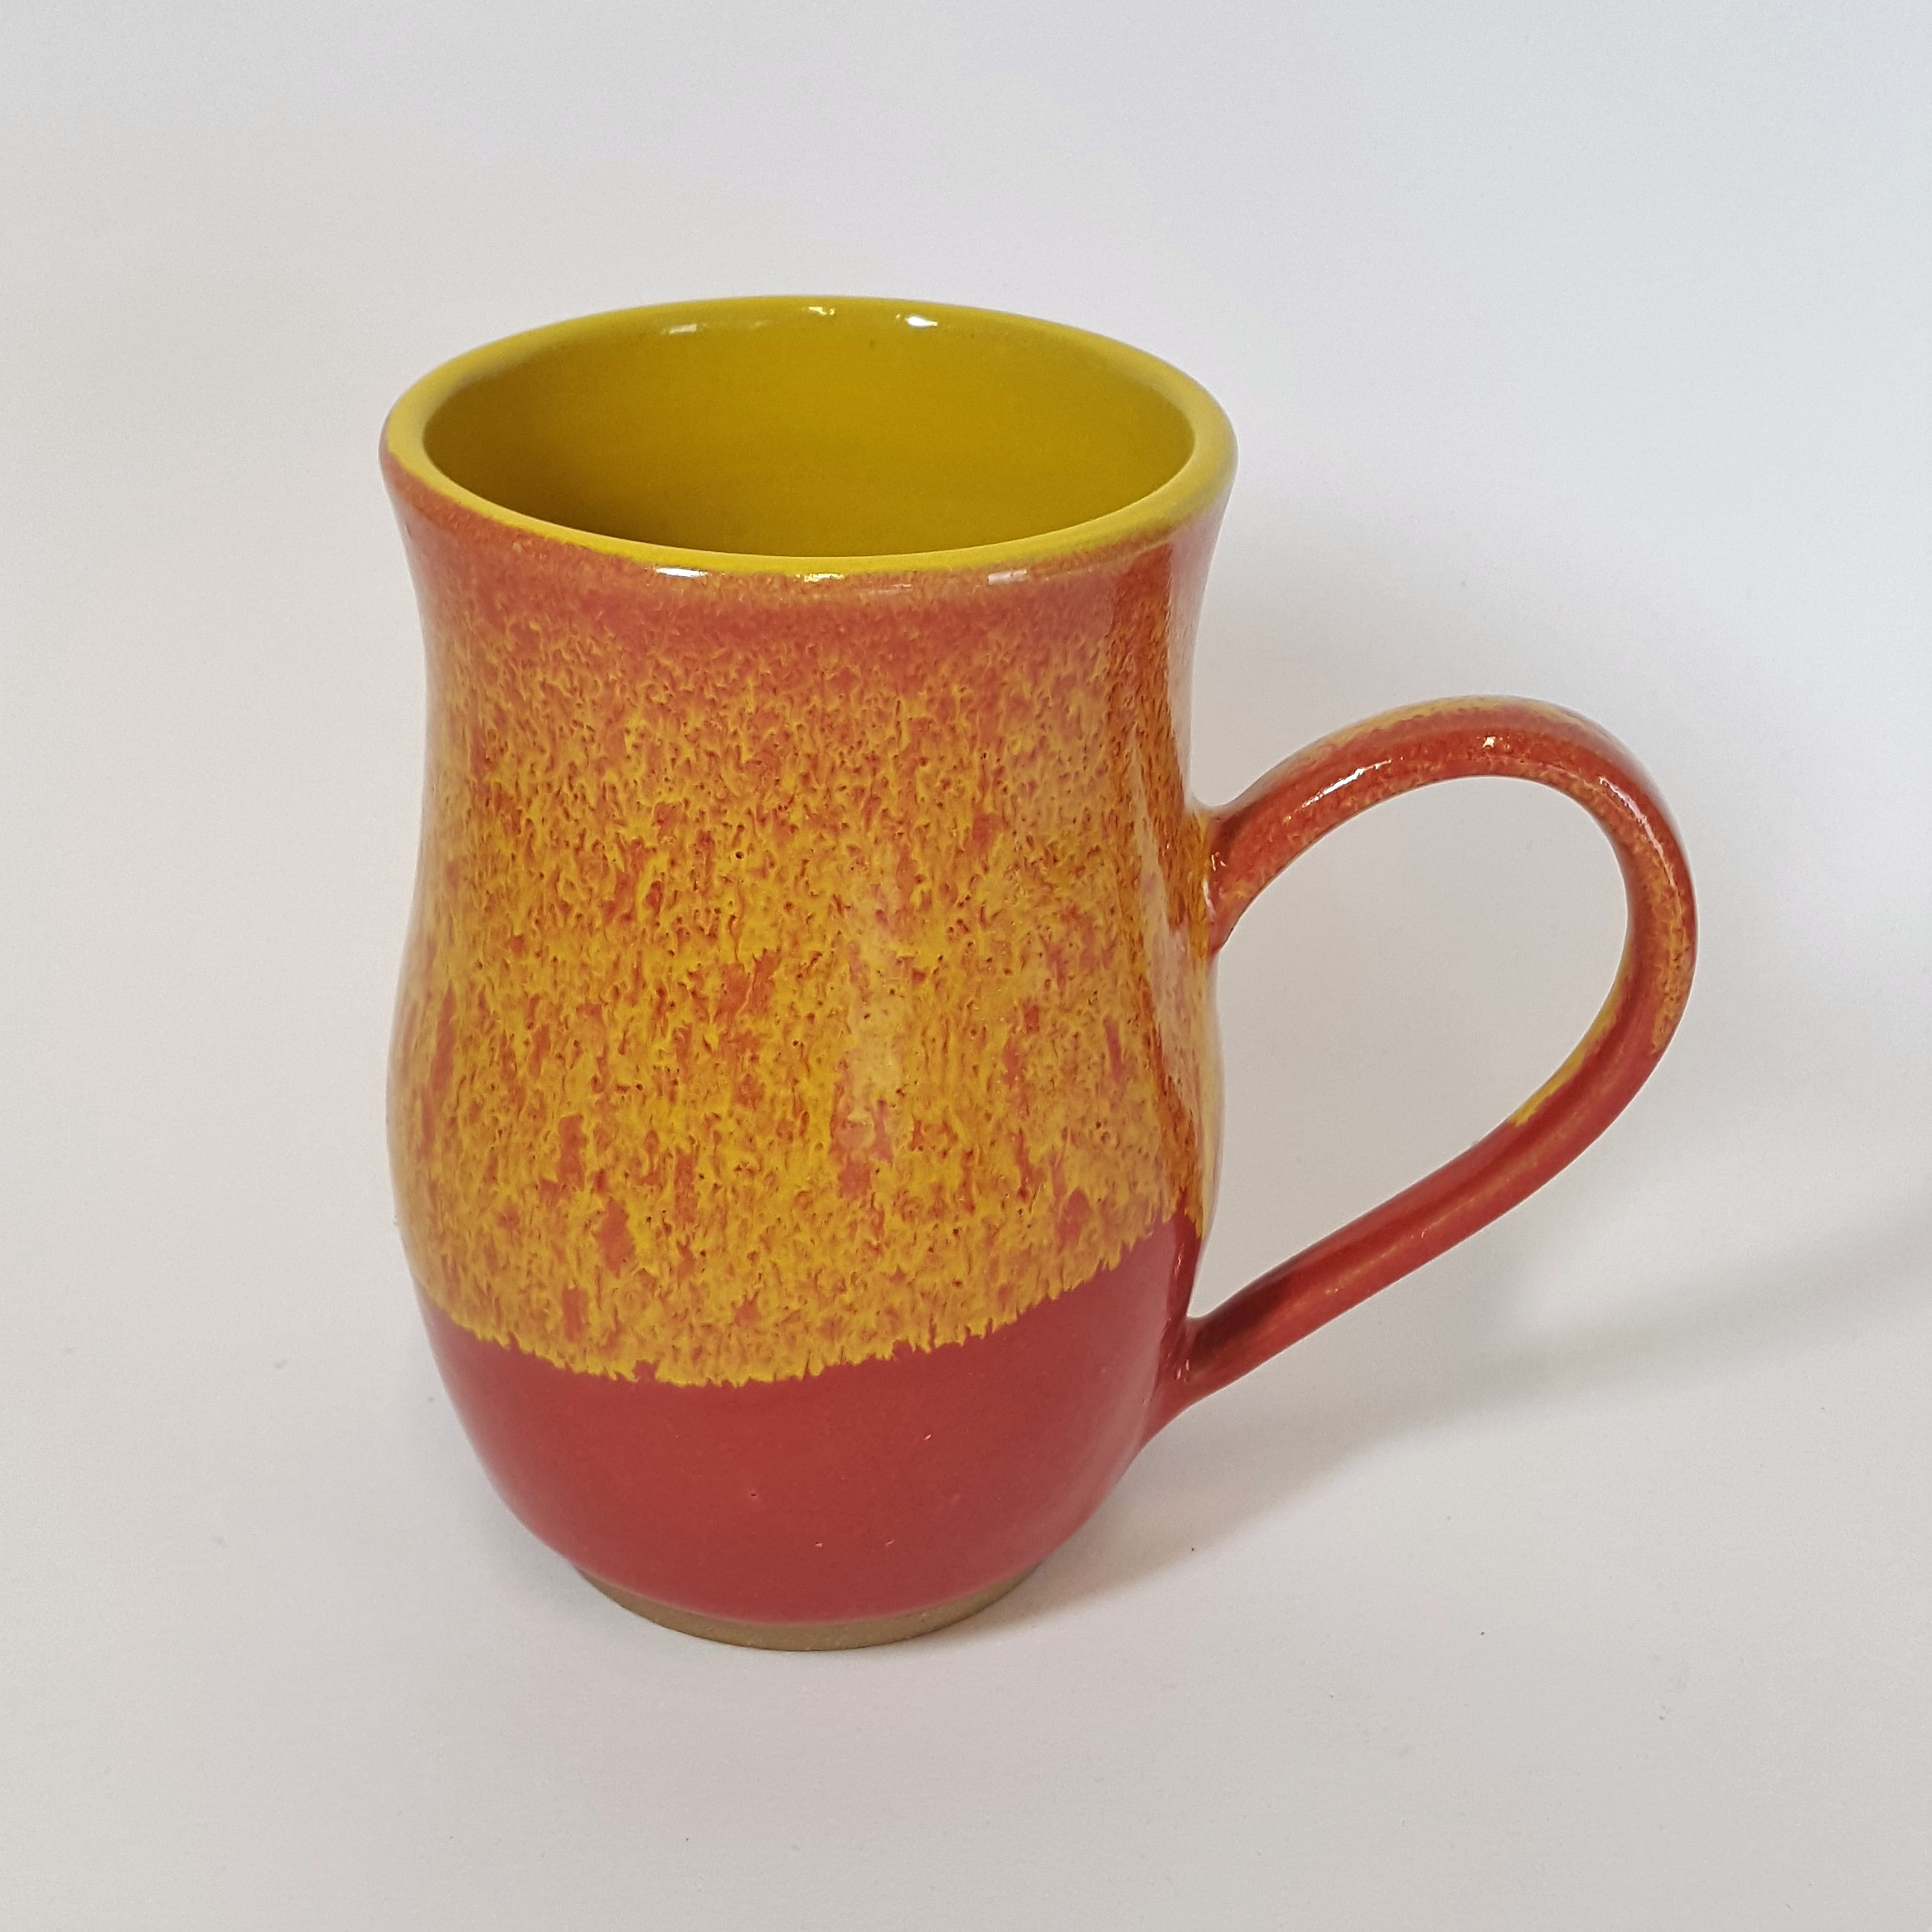 20 oz. Liquid Courage Mug - $32